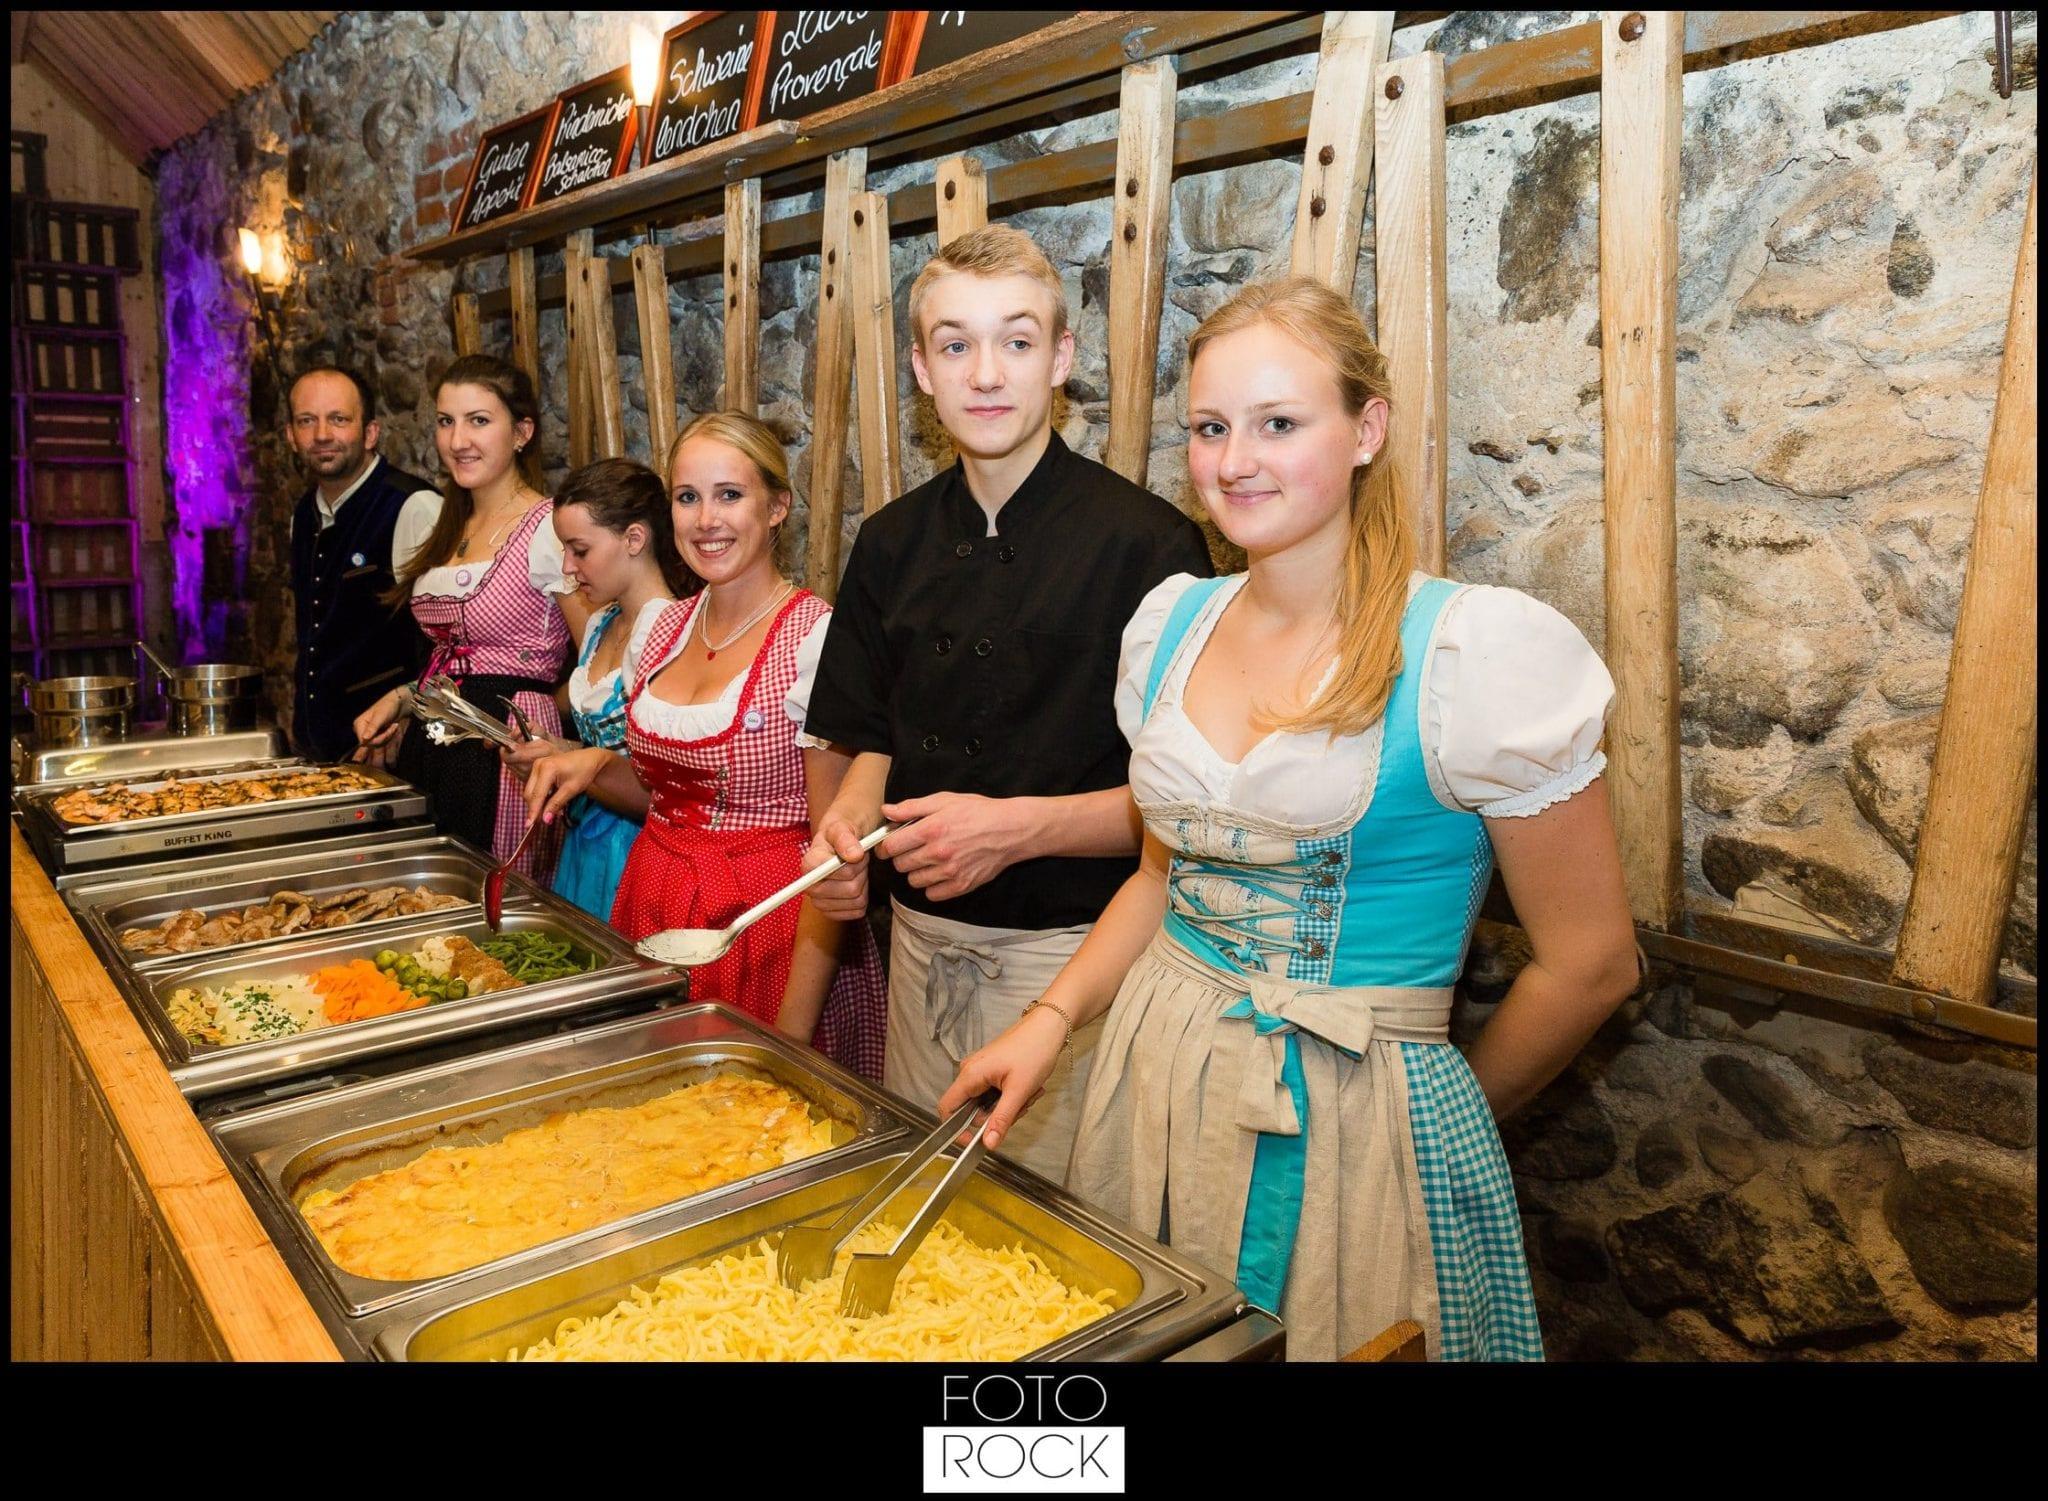 Hochzeit Freiburg Muenster Goldener Adler Oberried buffet catering essen